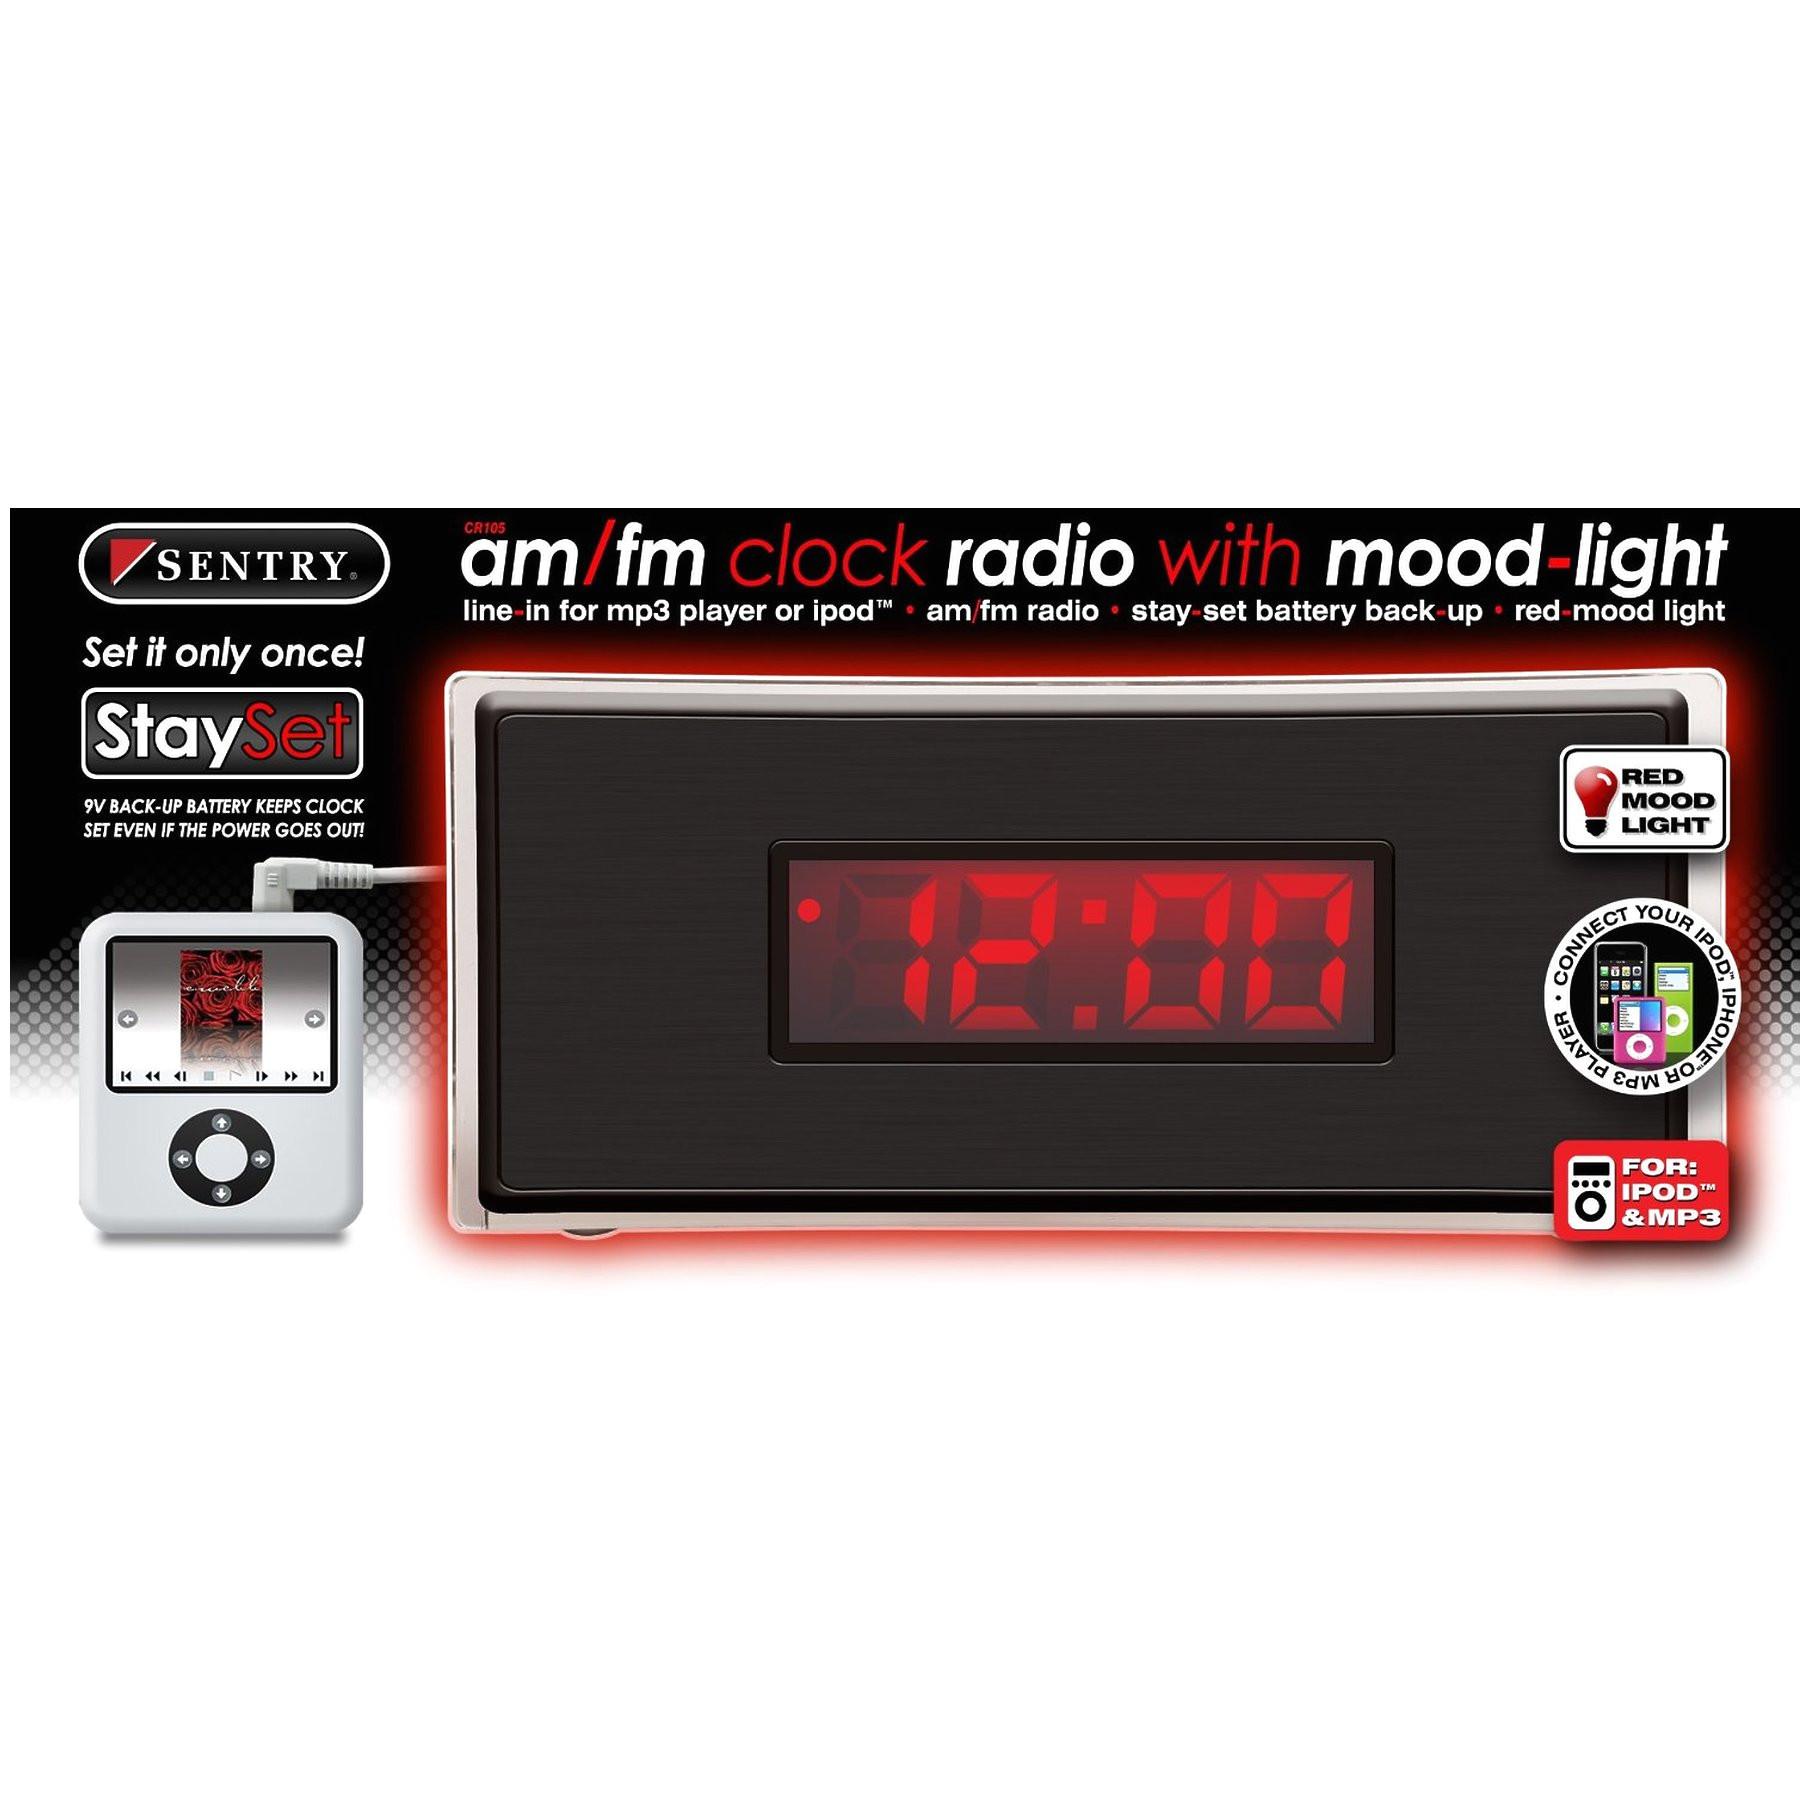 srt appliance parts cr105 sentry am fm radio clock with mood light